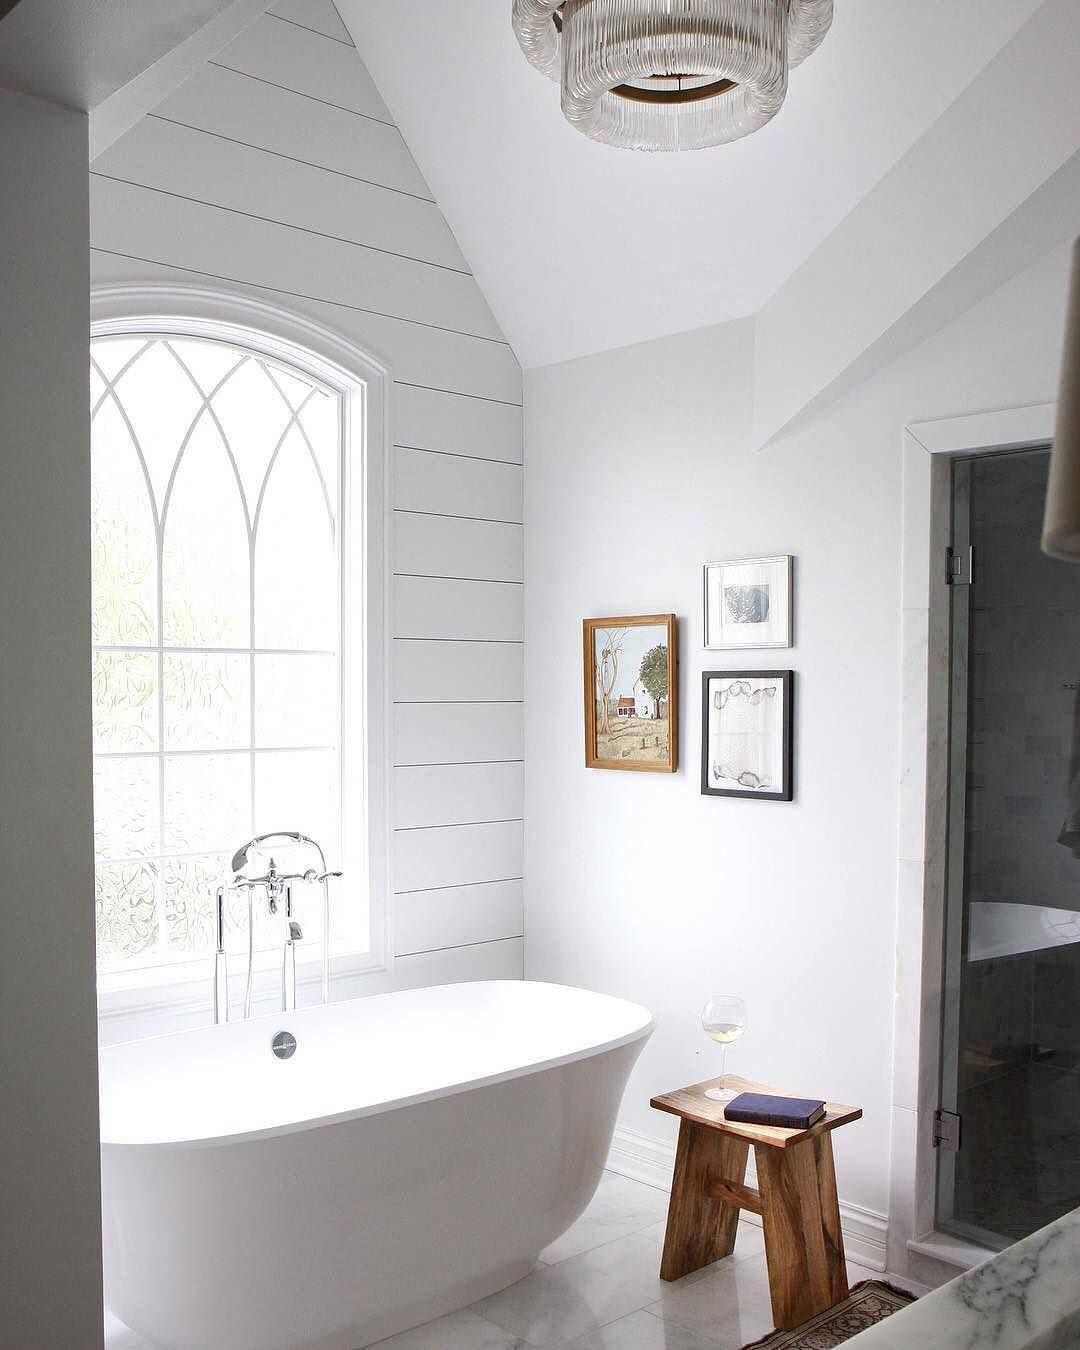 Instagram | Home - Bathroom | Pinterest | Bathtubs, Corner and Bath